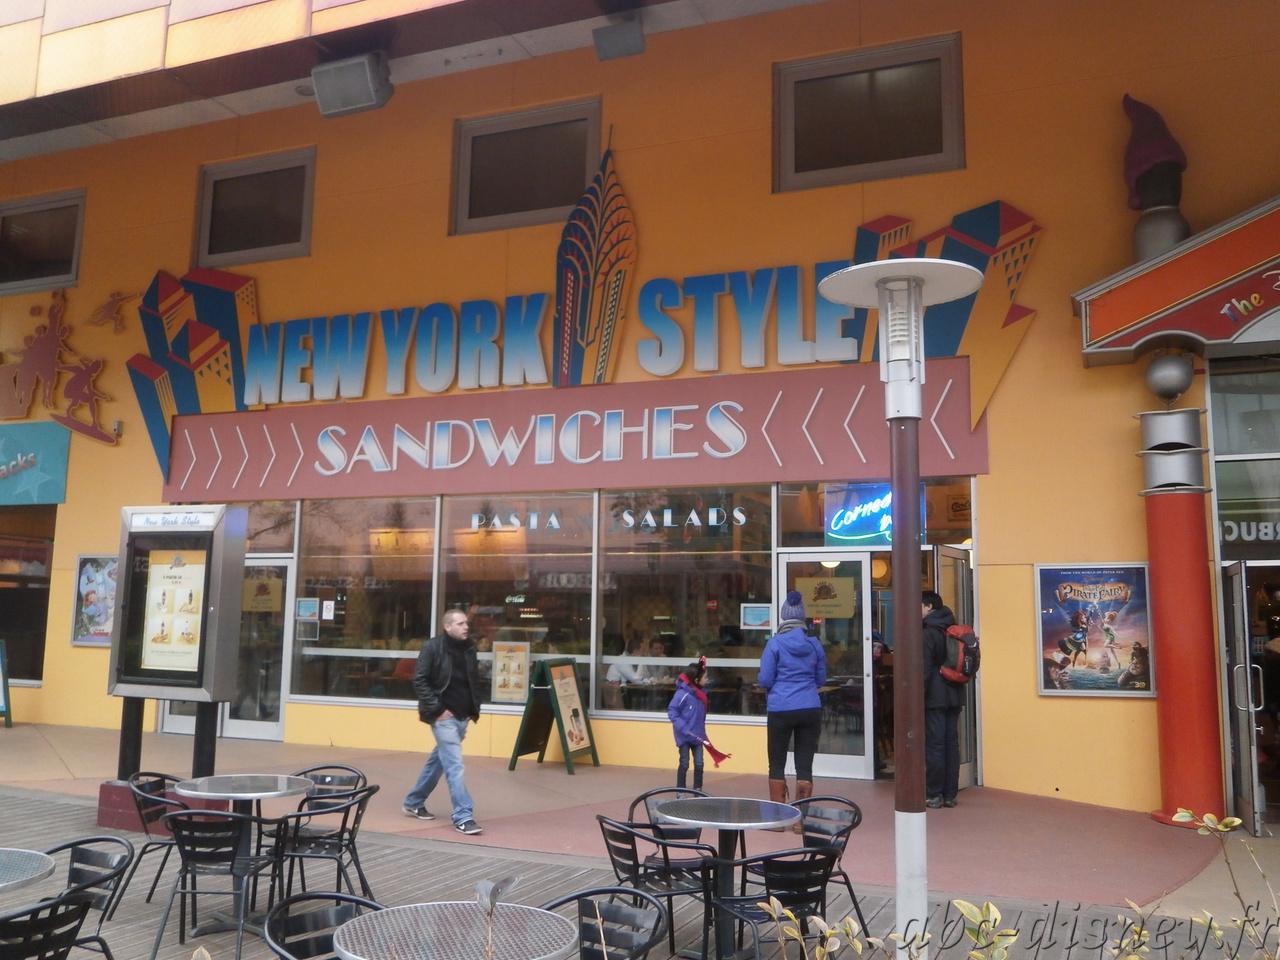 R new york style sandwich 3